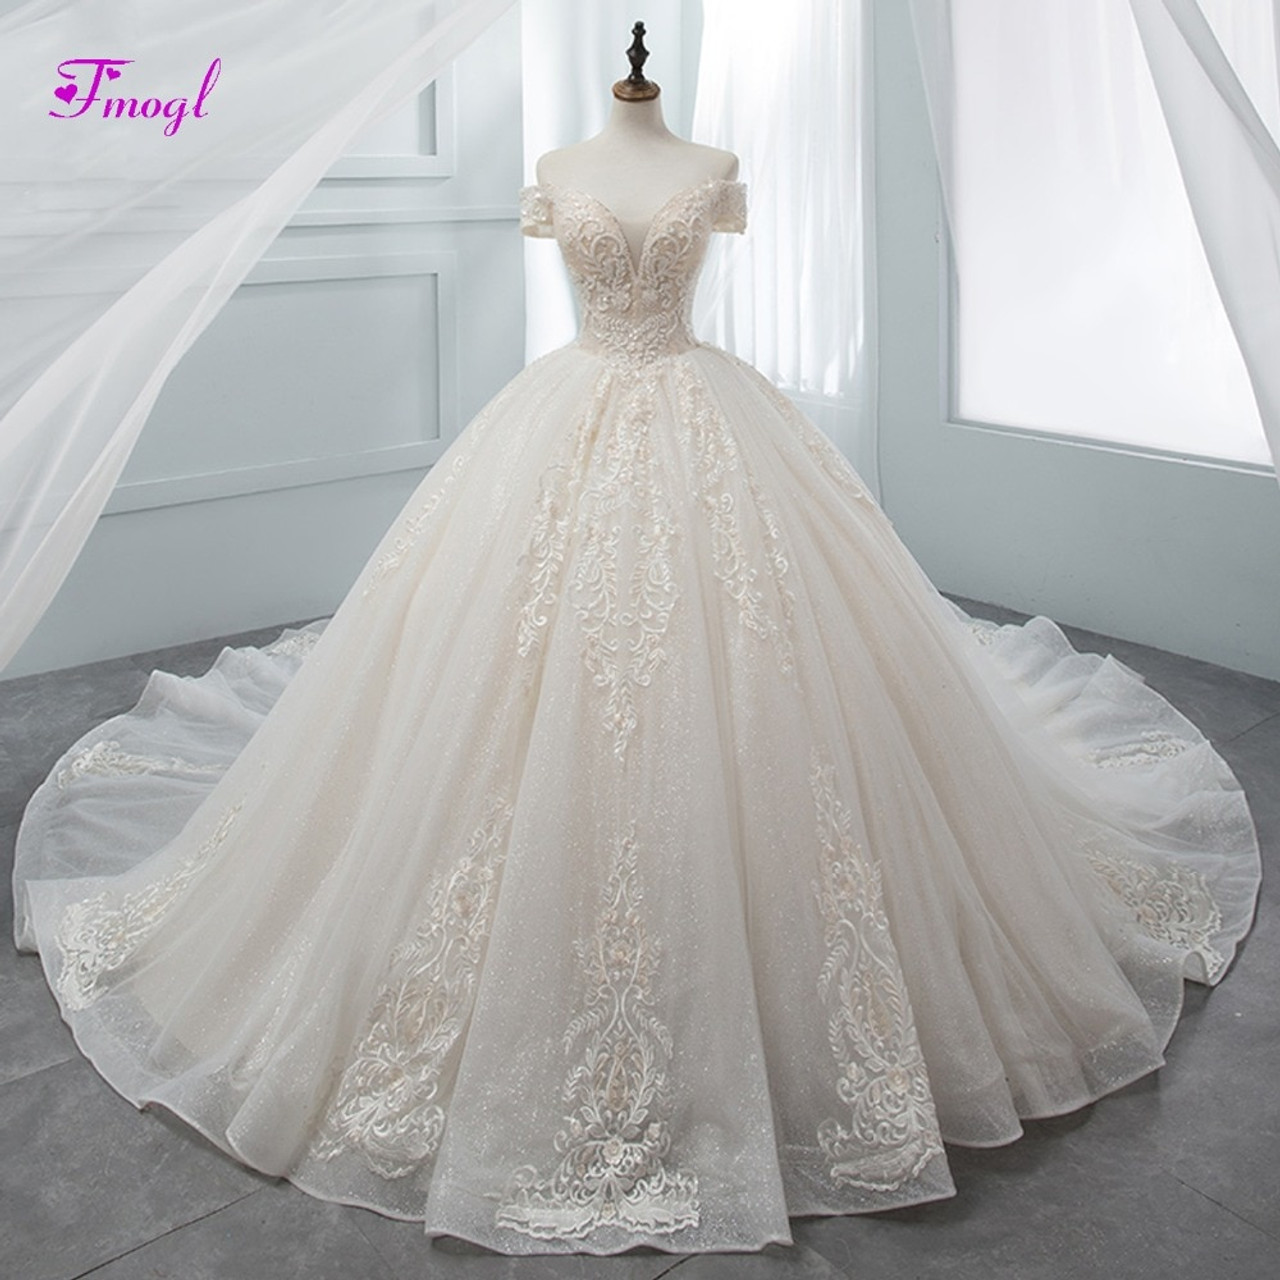 f9a6b81df02c Fmogl Gorgeous Appliques Chapel Train Ball Gown Wedding Dress 2018 Luxury  Beaded Boat Neck Princess Bridal Gown Vestido de Noiva - OnshopDeals.Com